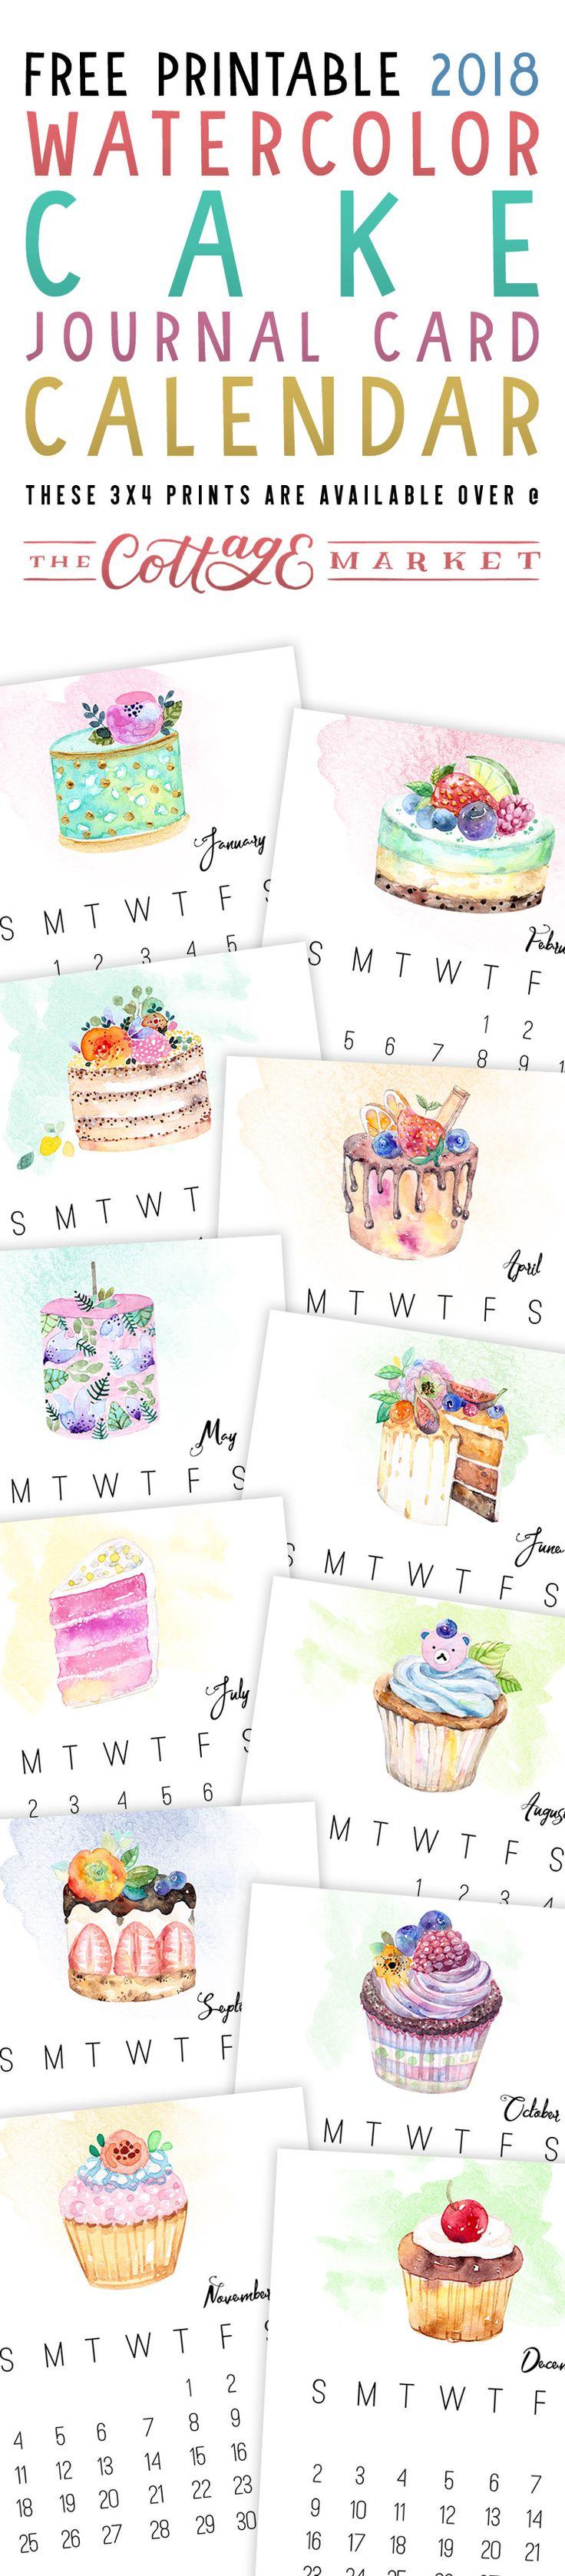 Free Printable 2018 Watercolor Cake Journal Card Calendar